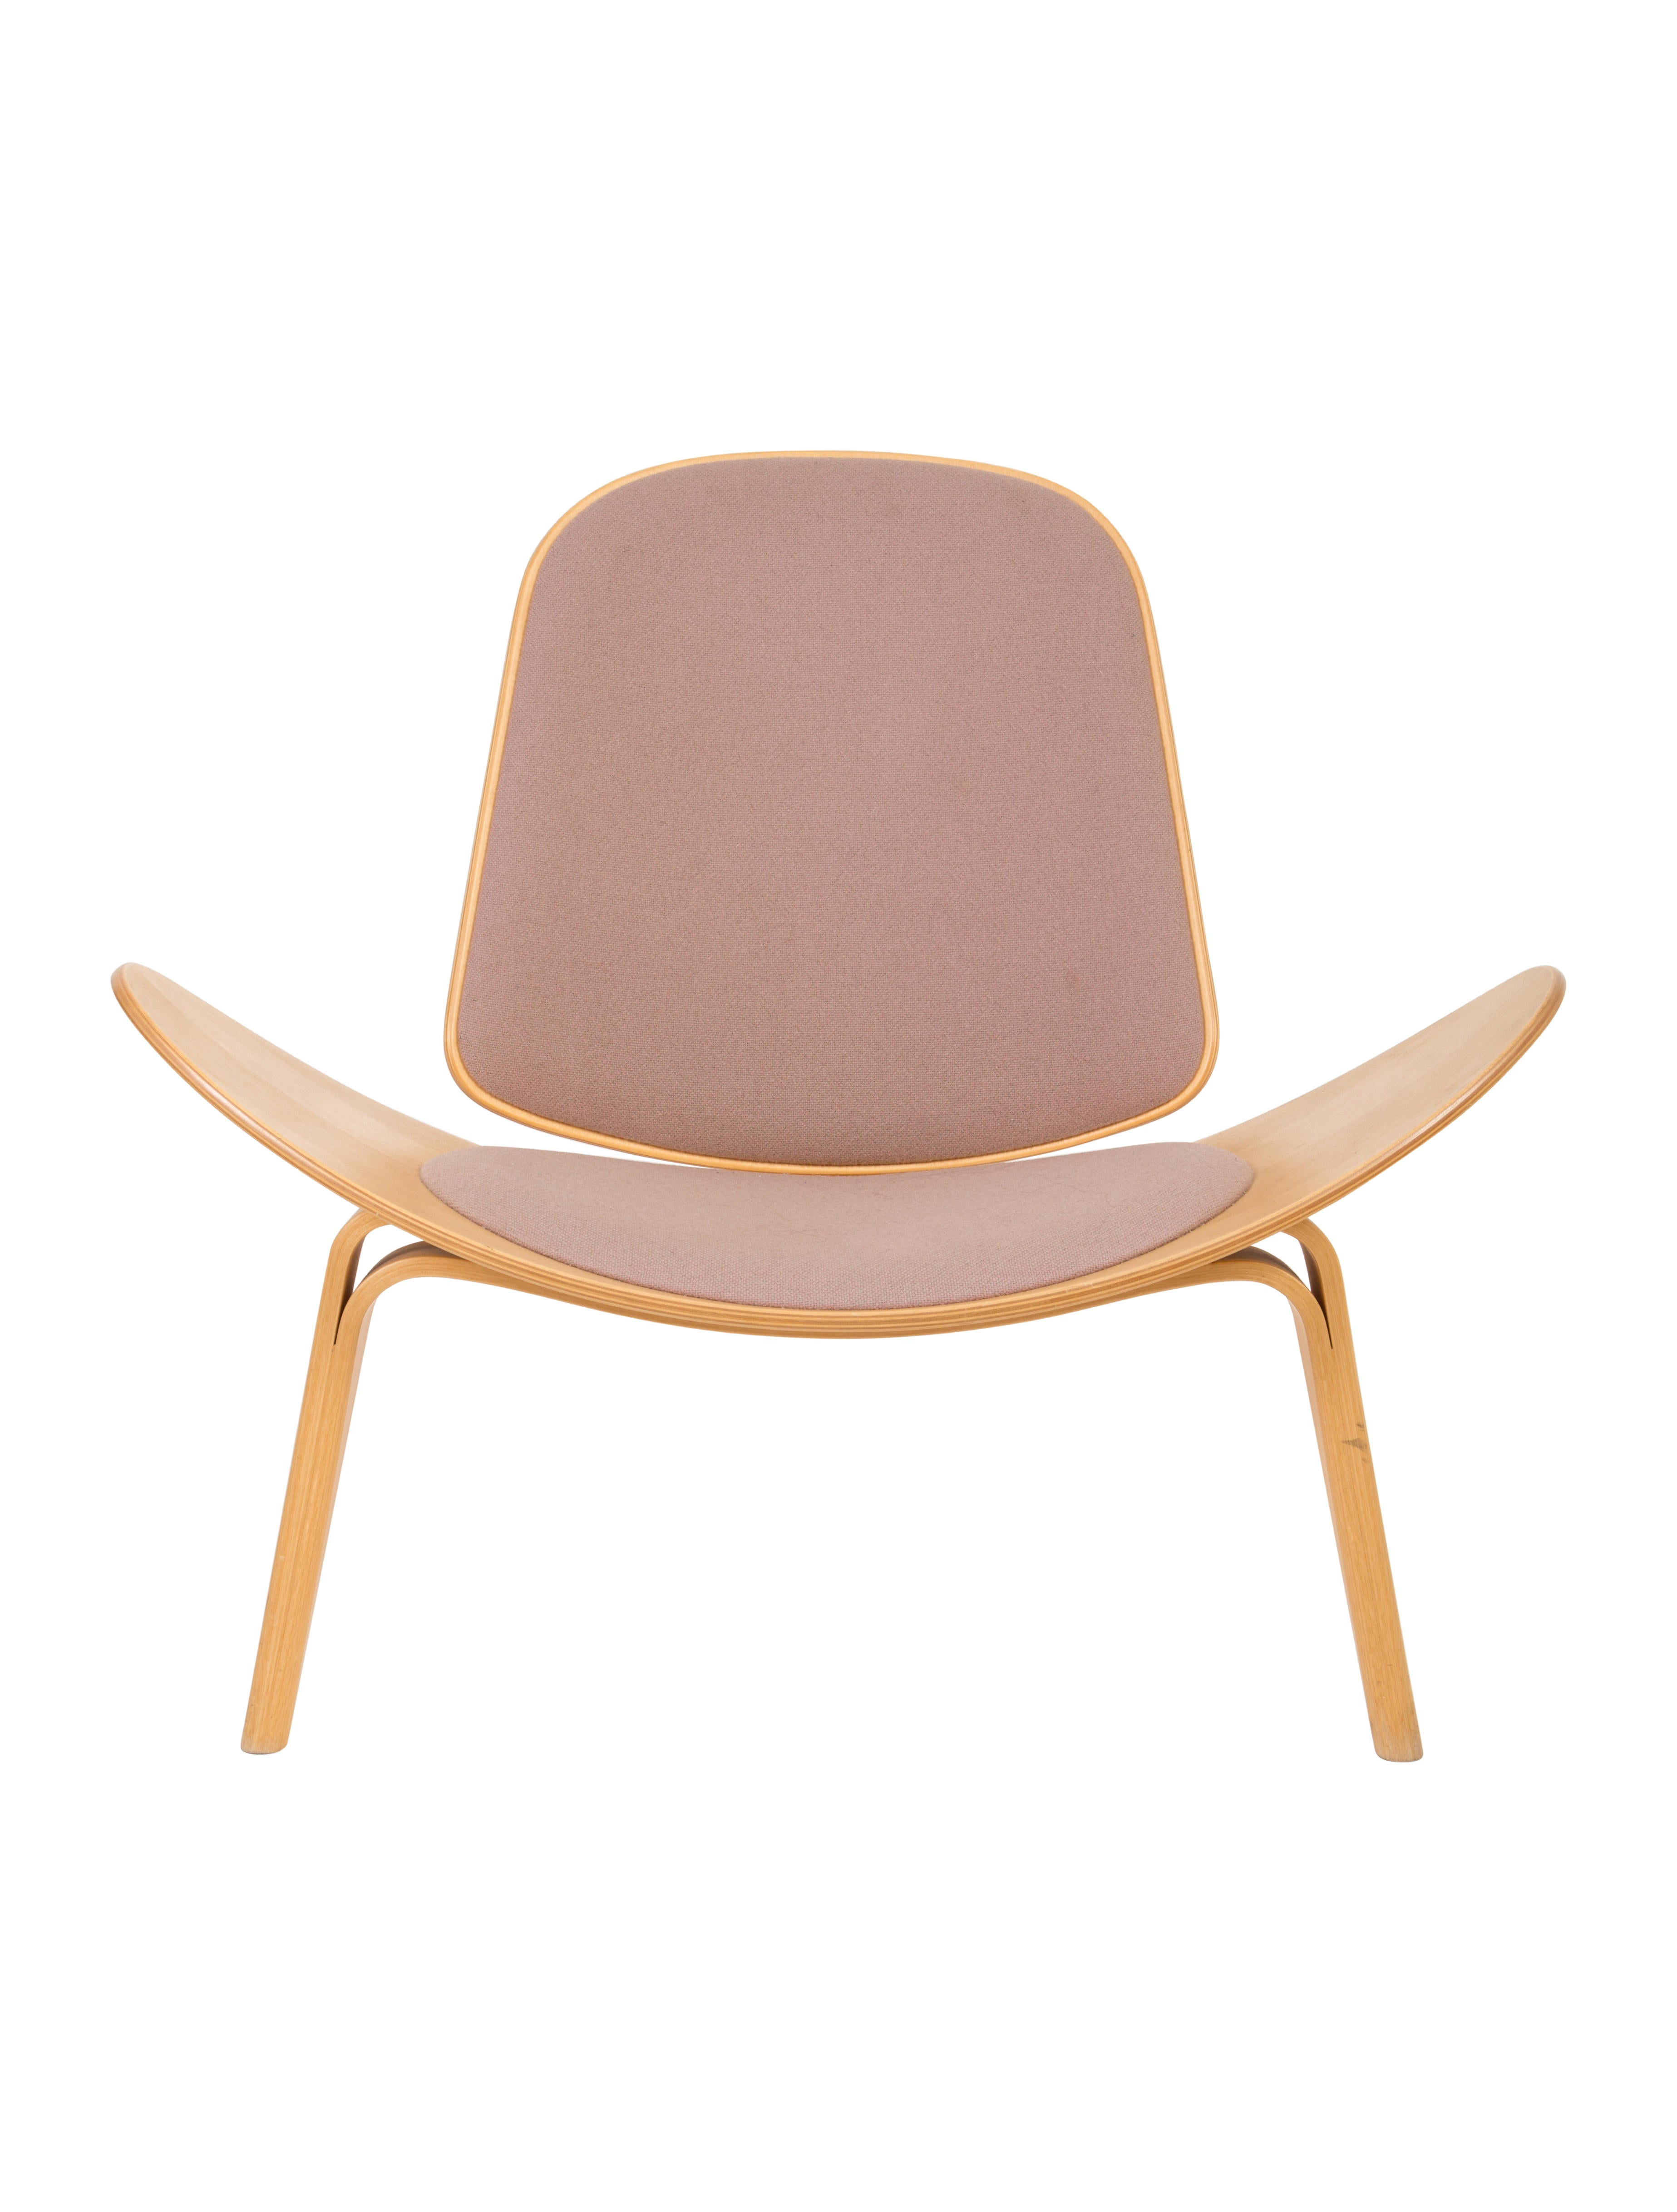 Carl Hansen Son Hans J Wegner Shell Chair Furniture